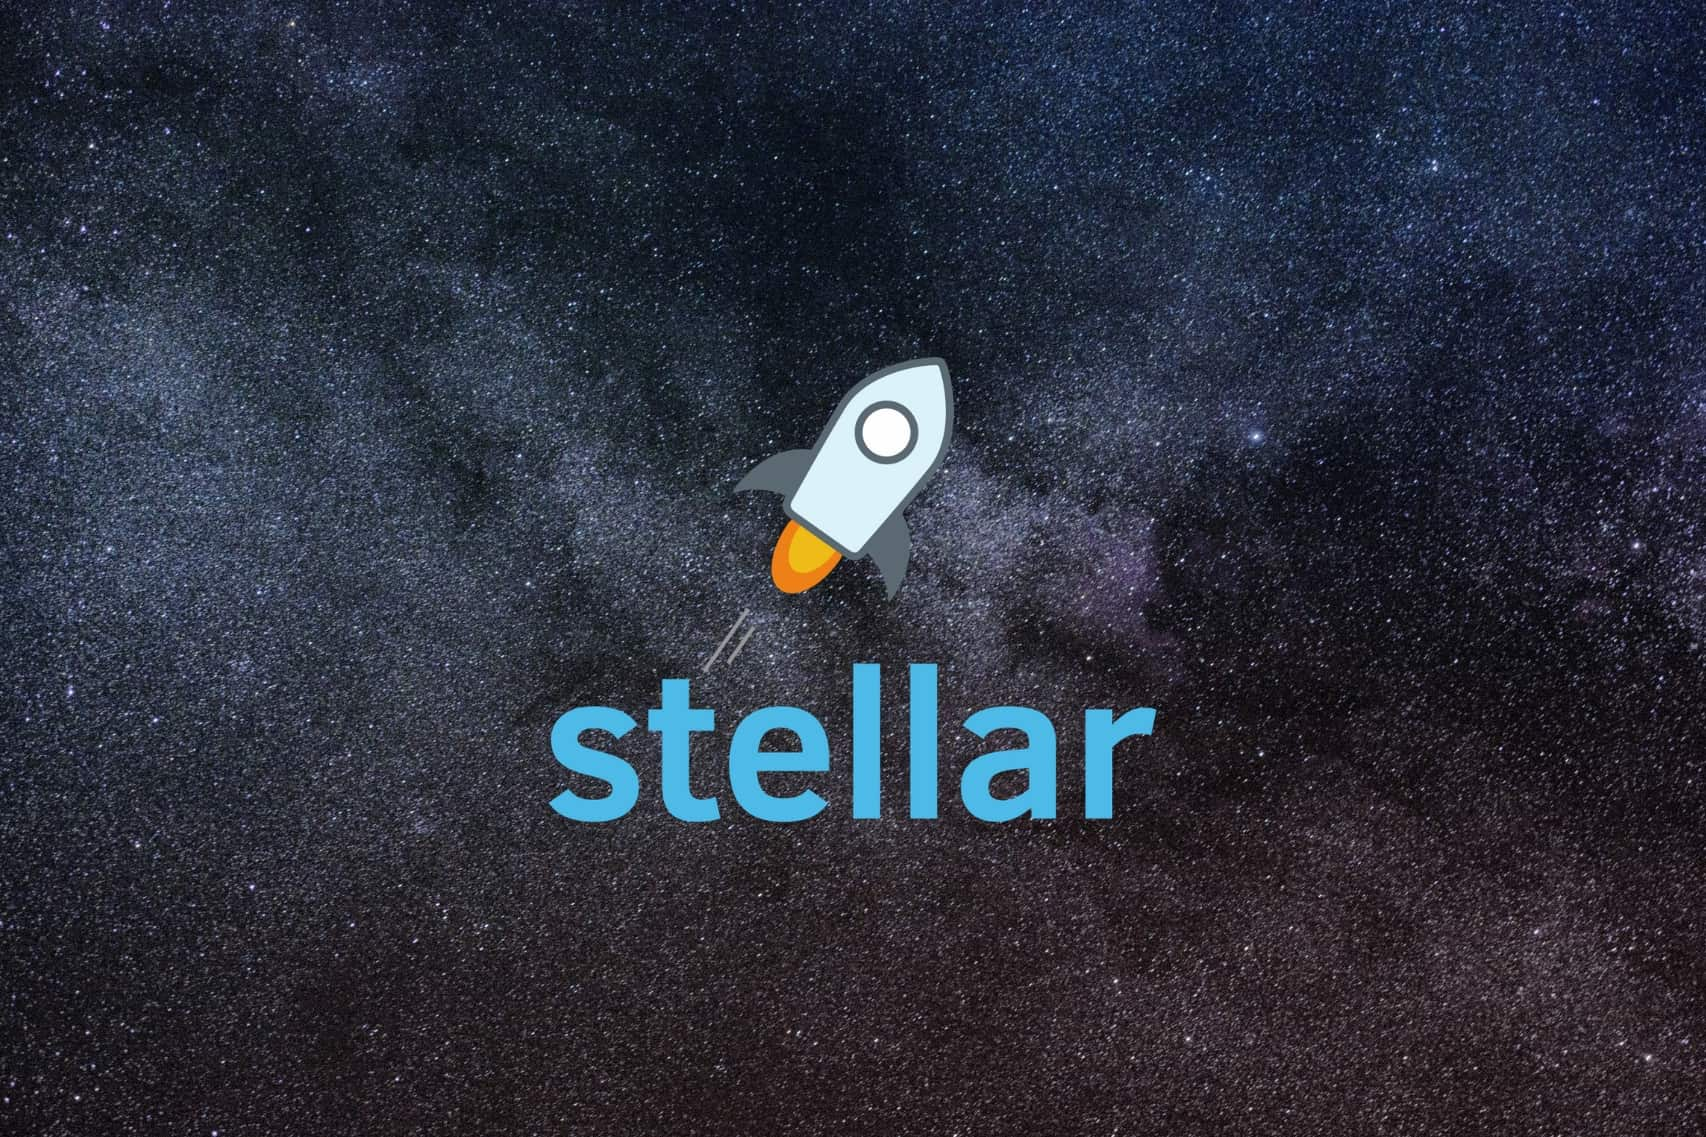 Stellars Interstellar Merge min - Stellar (XLM) Is Working Hard To Boost Its Ecosystem, Amidst Positive Price Predictions For XLM